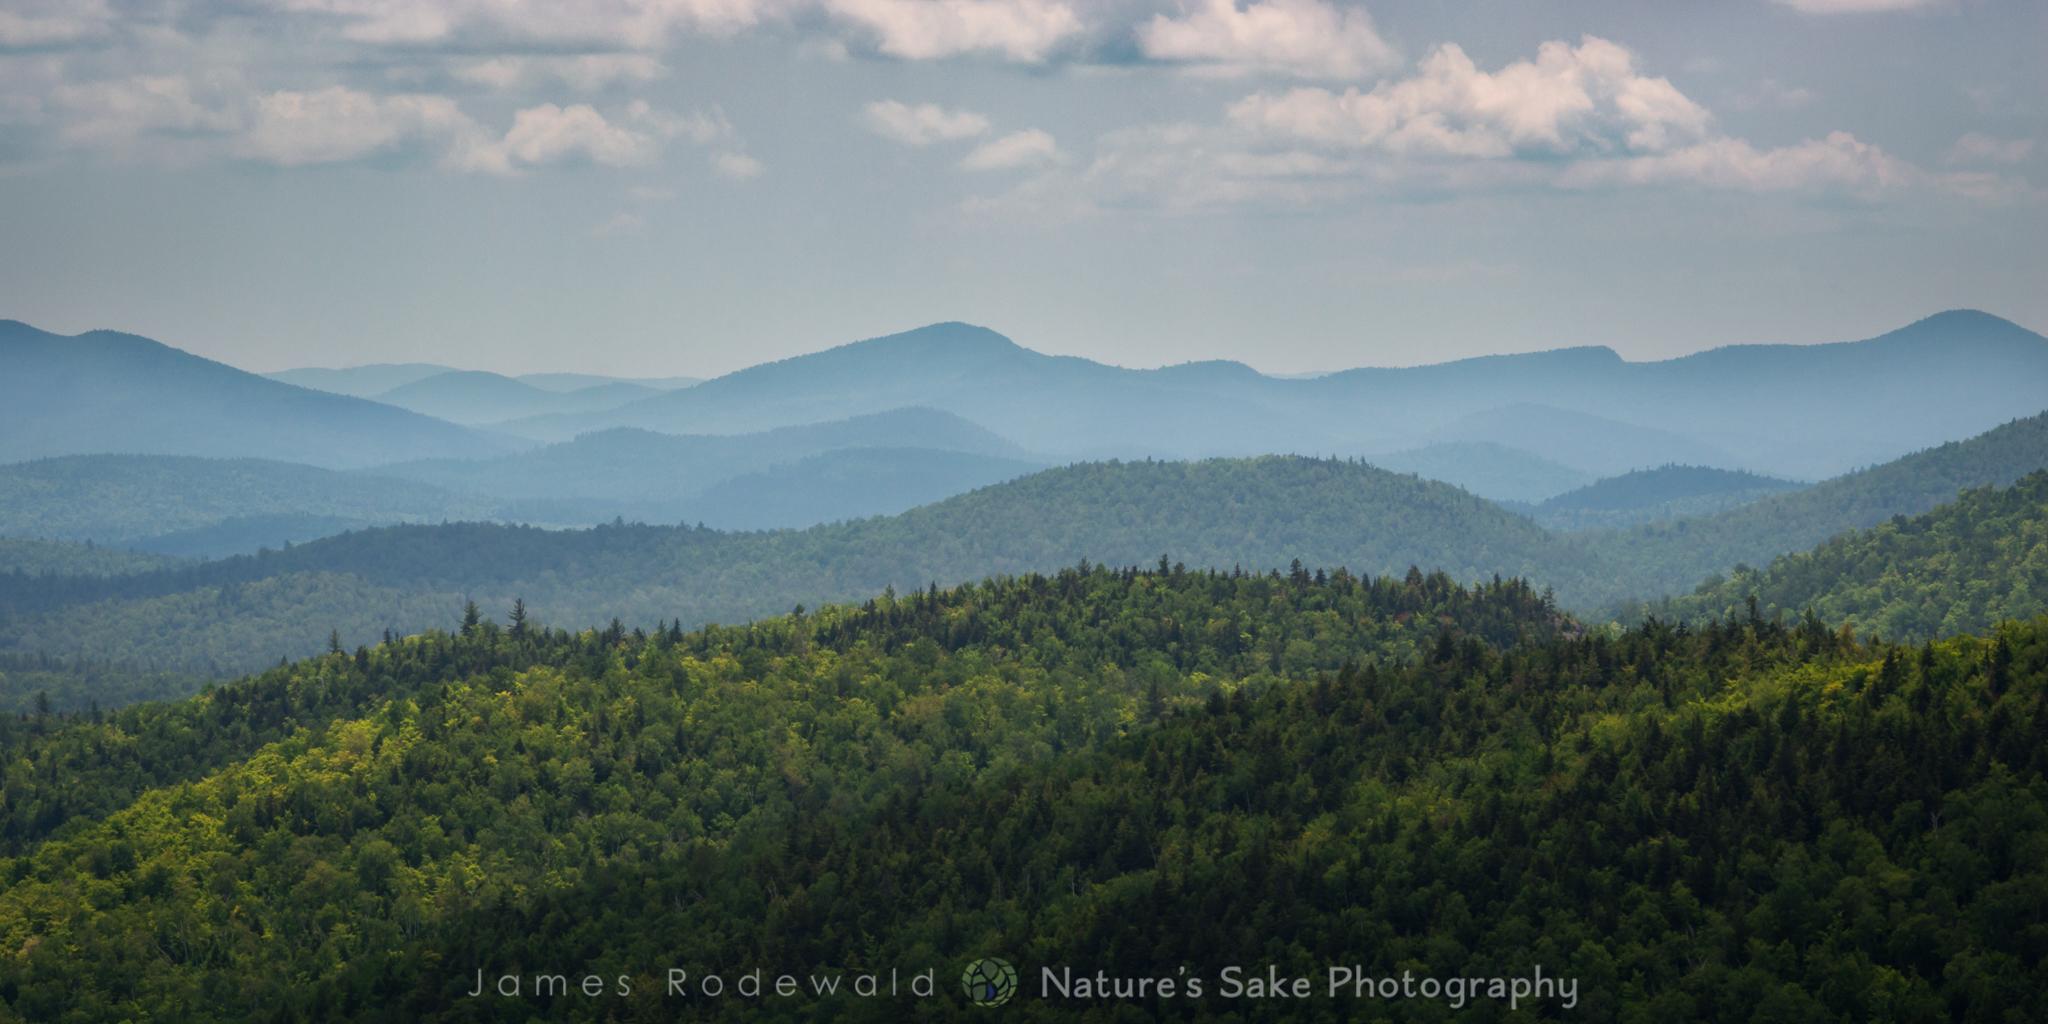 """Adirondack Skies"" to benefit Adirondack Council"